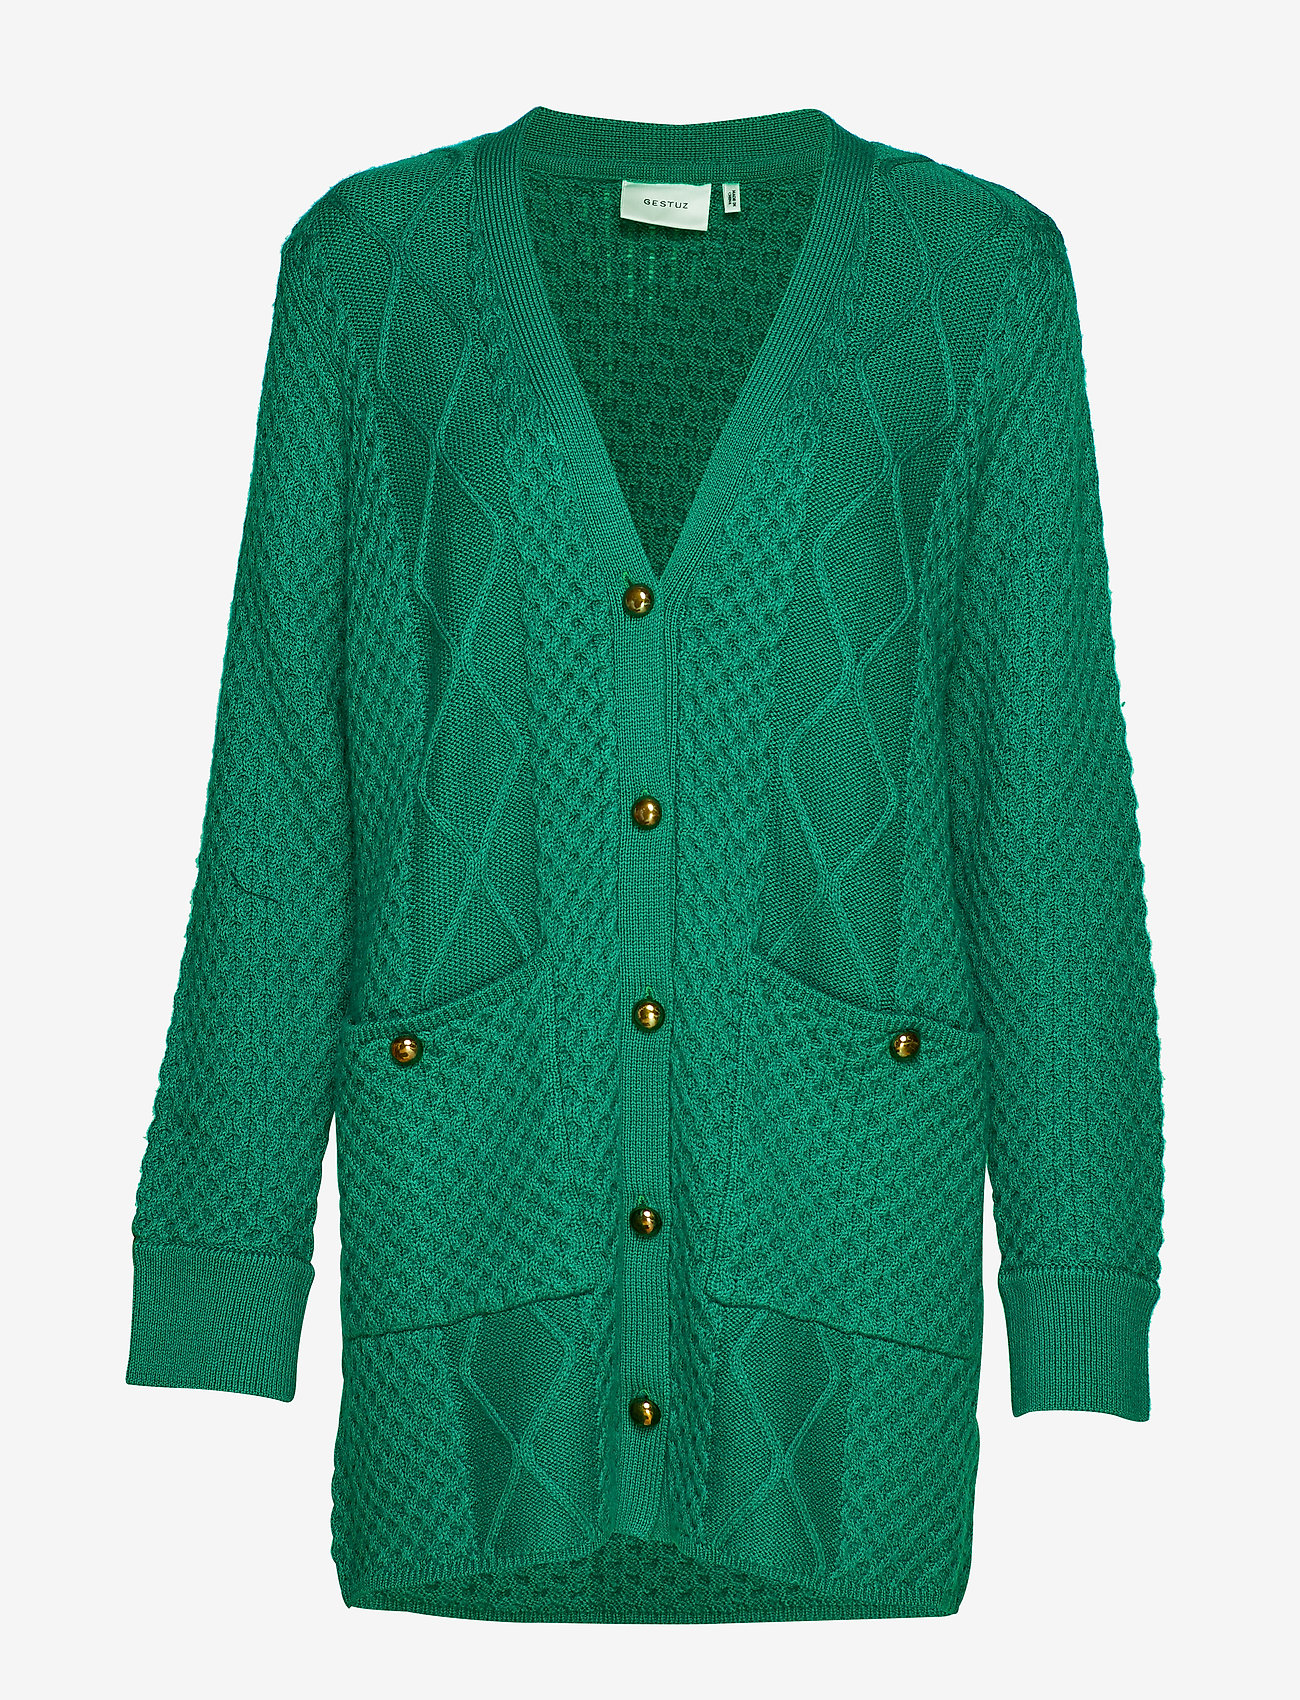 Gestuz - MichaGZ cardigan MA19 - cardigans - ultramarine green - 1